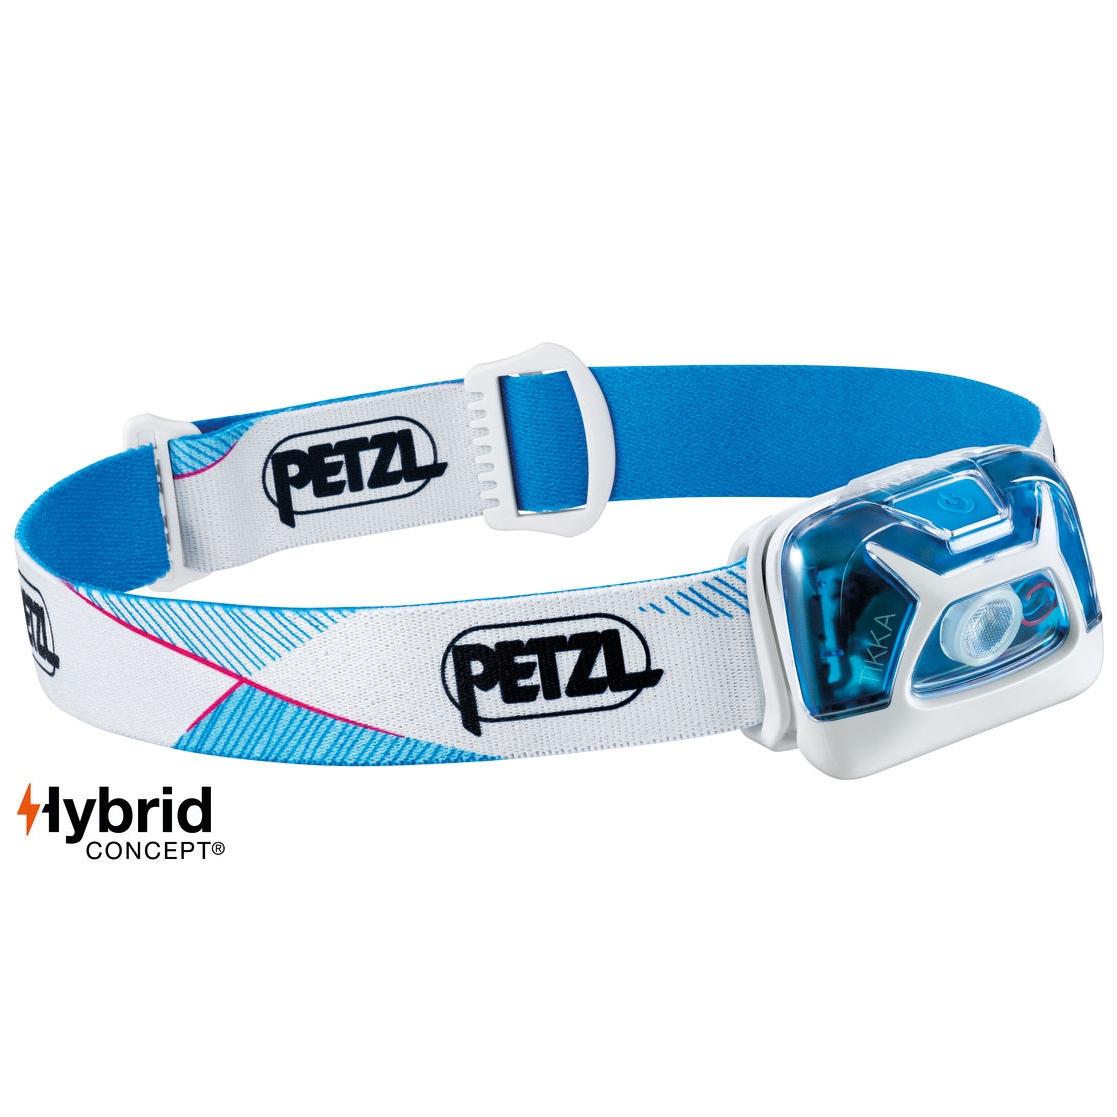 Petzl Tikka 300 Lumens Hybrid Headlamp - White